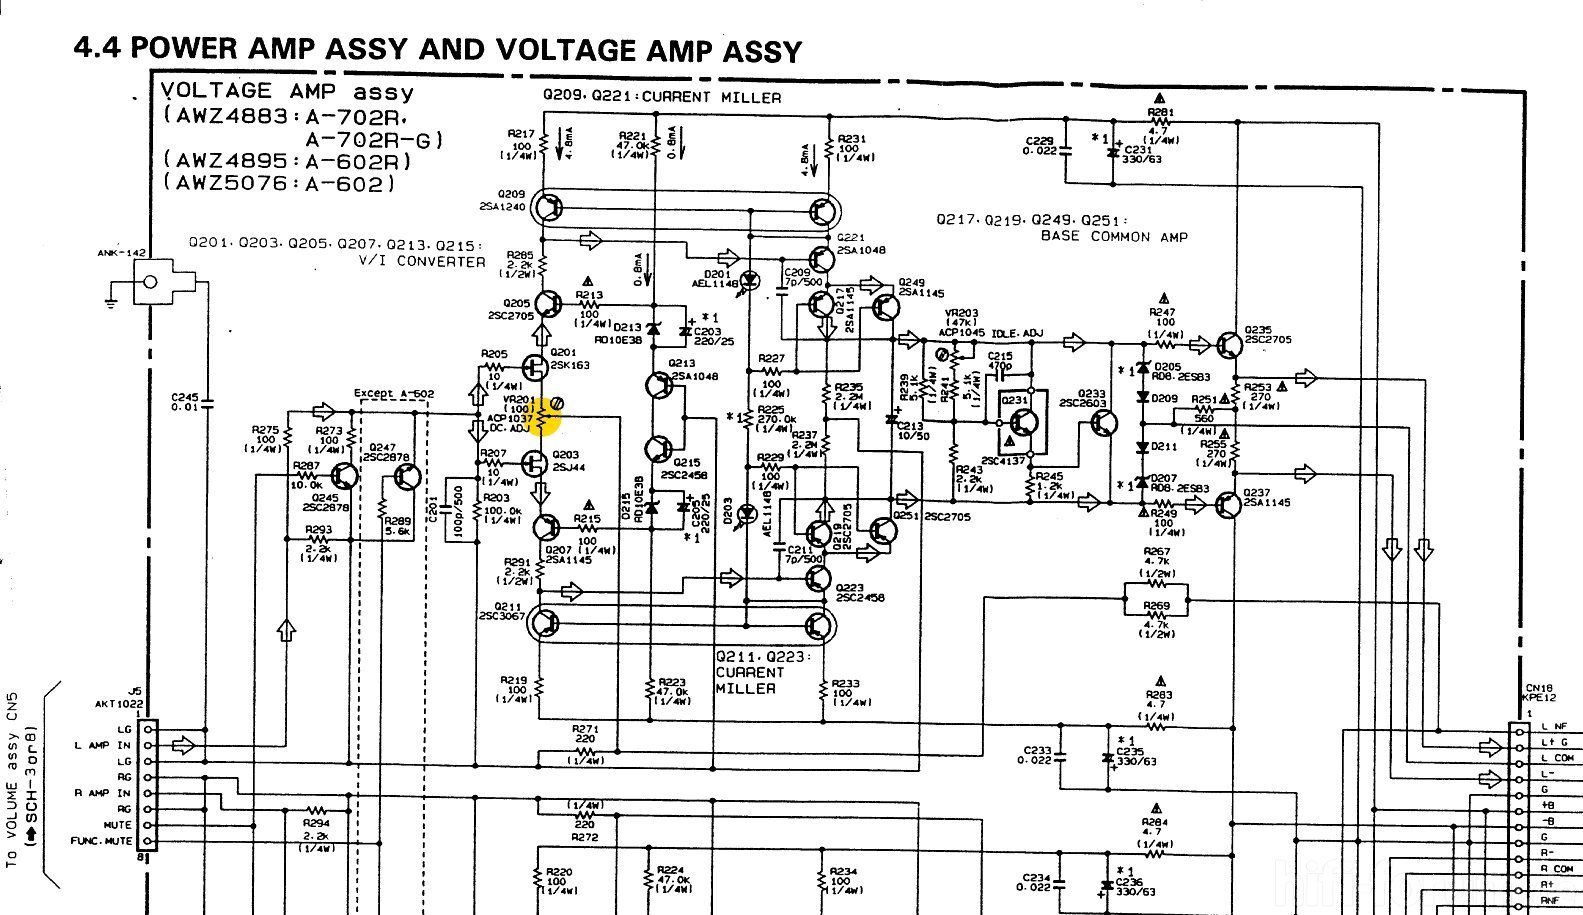 pioneer a 702r schematic detail power amp voltage amplifier assembly rh hifi forum de Voltage Amplifier Circuit Voltage Amplifier Circuit